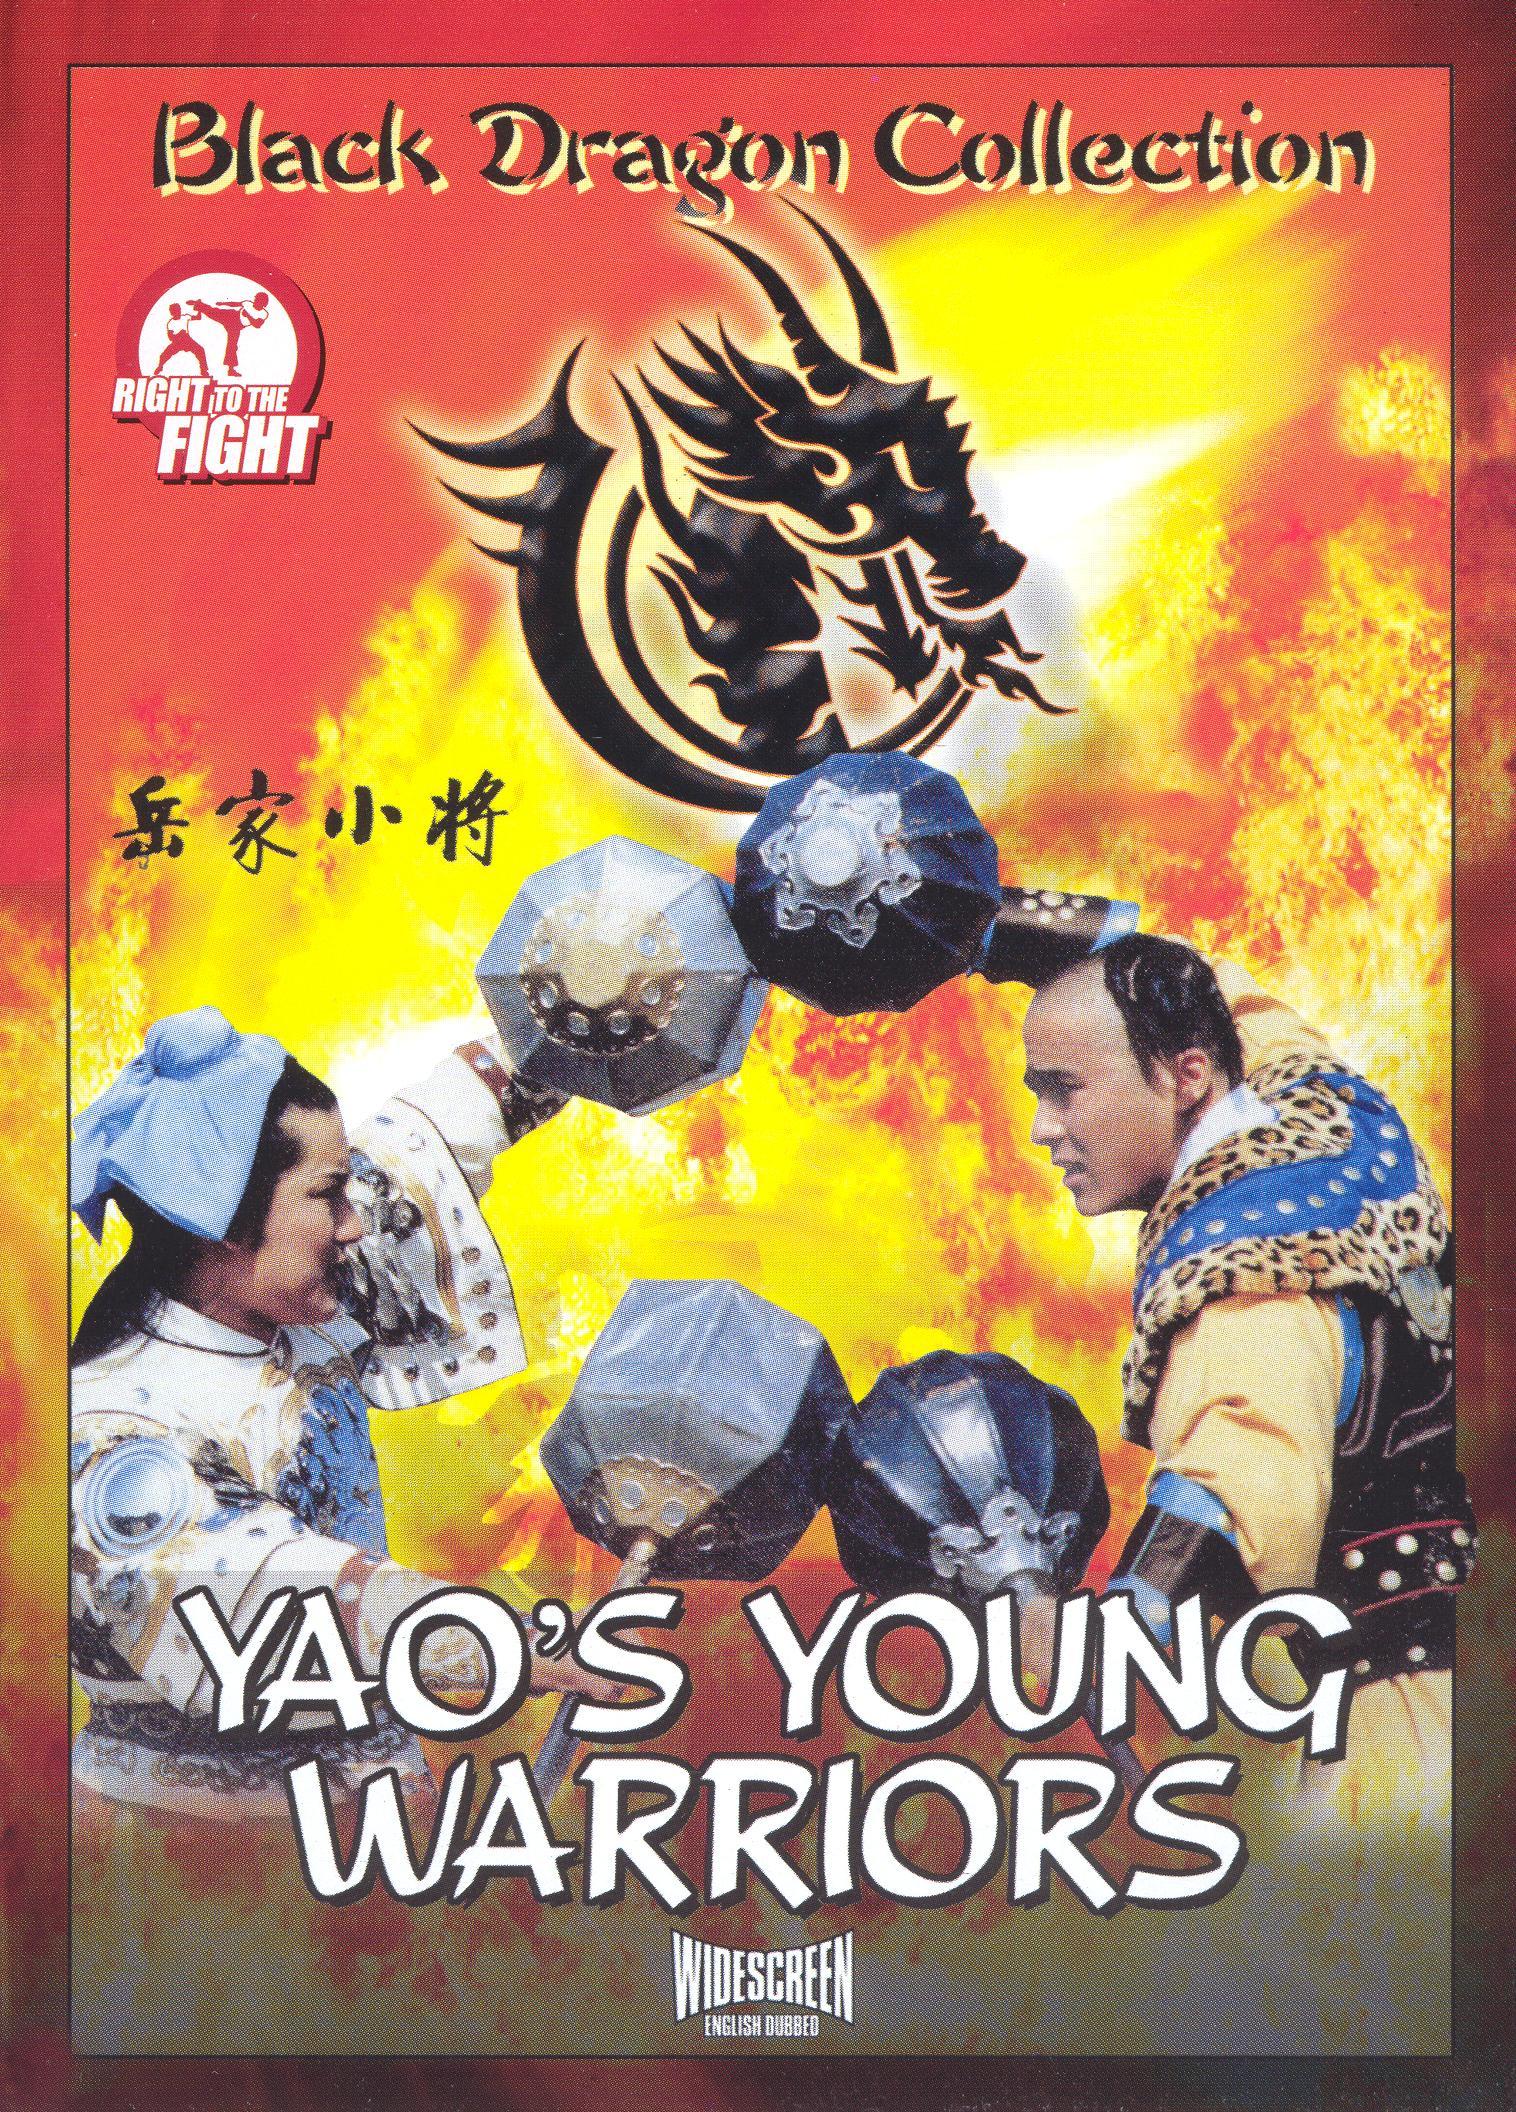 Yao's Young Warriors